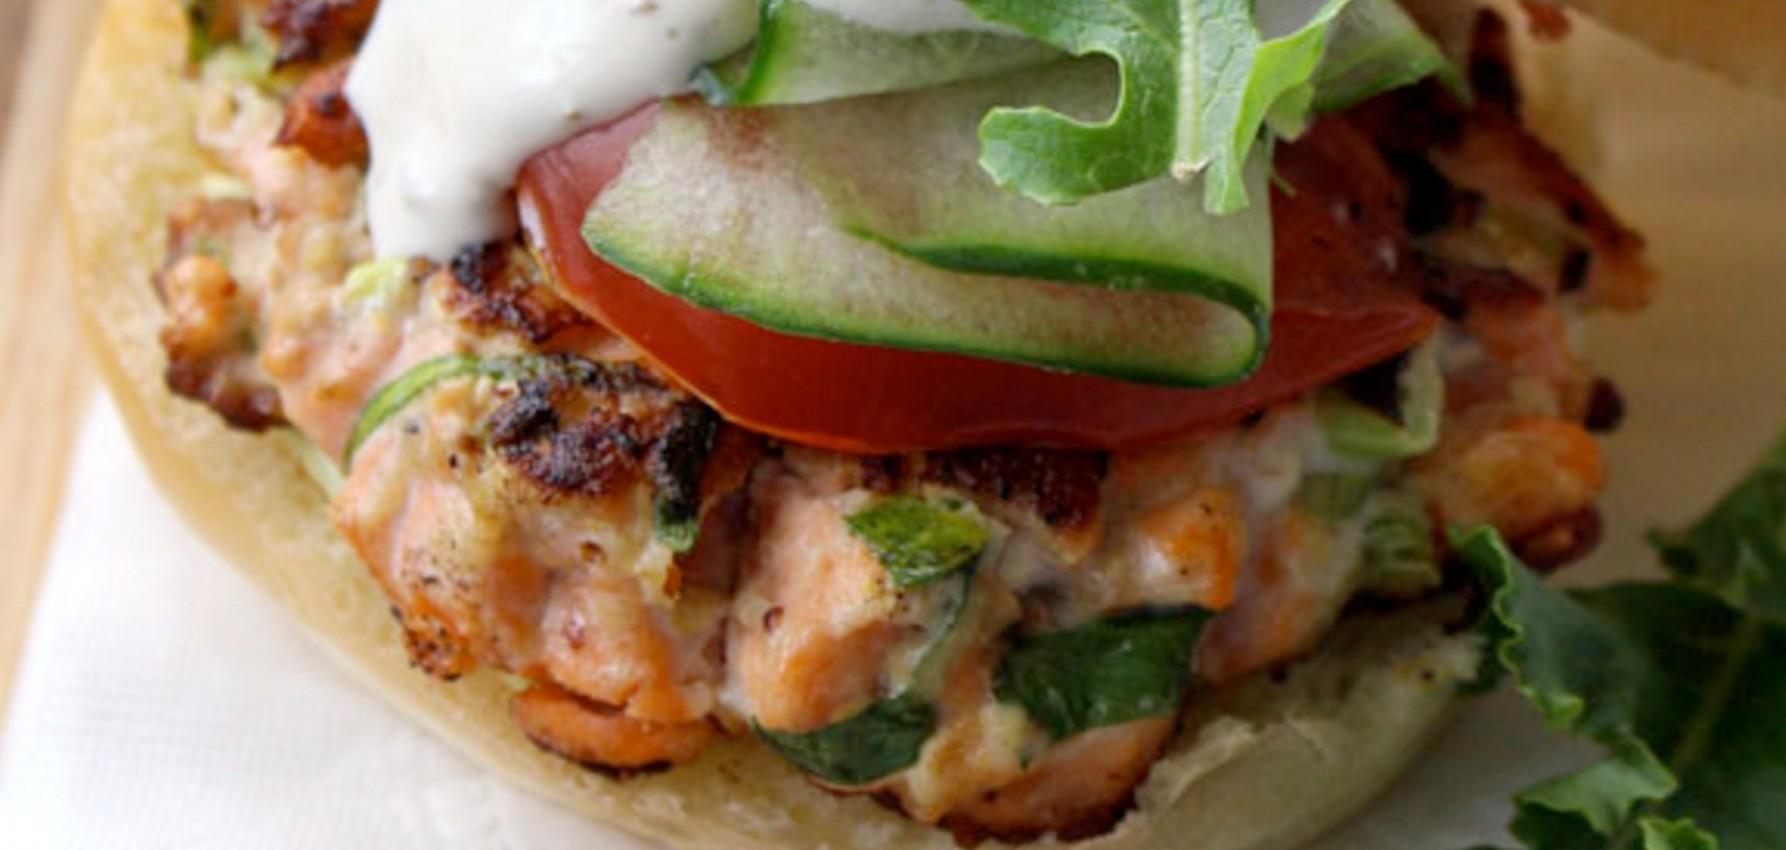 salmon-burger